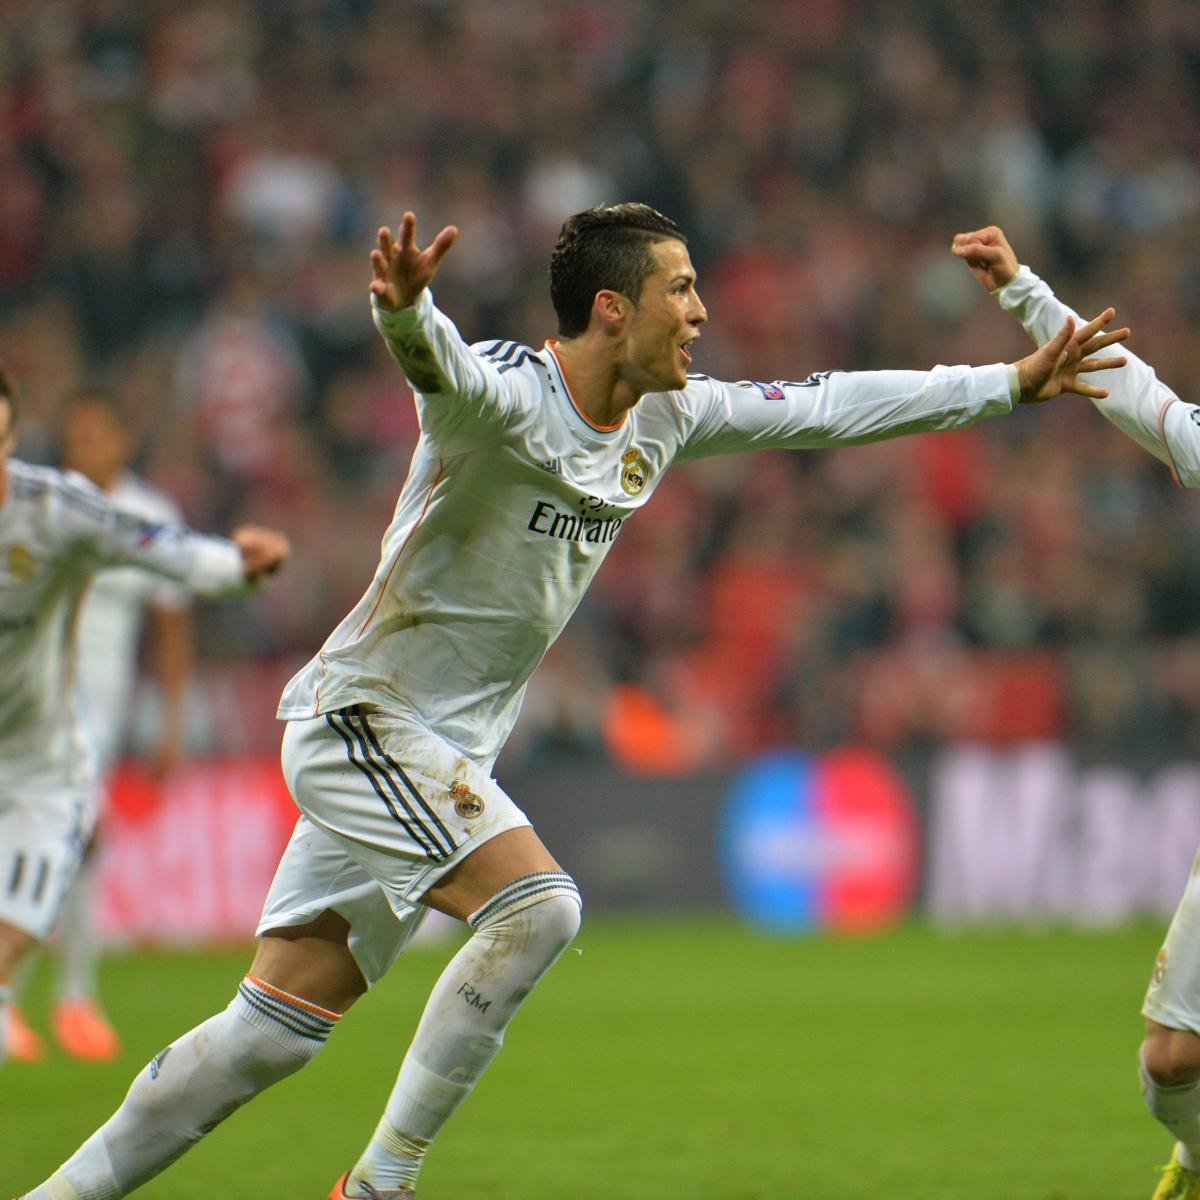 Cristiano Ronaldo S 4 Goals Lead Real Madrid To Win Vs: Cristiano Ronaldo Free-Kick Completes Real Madrid